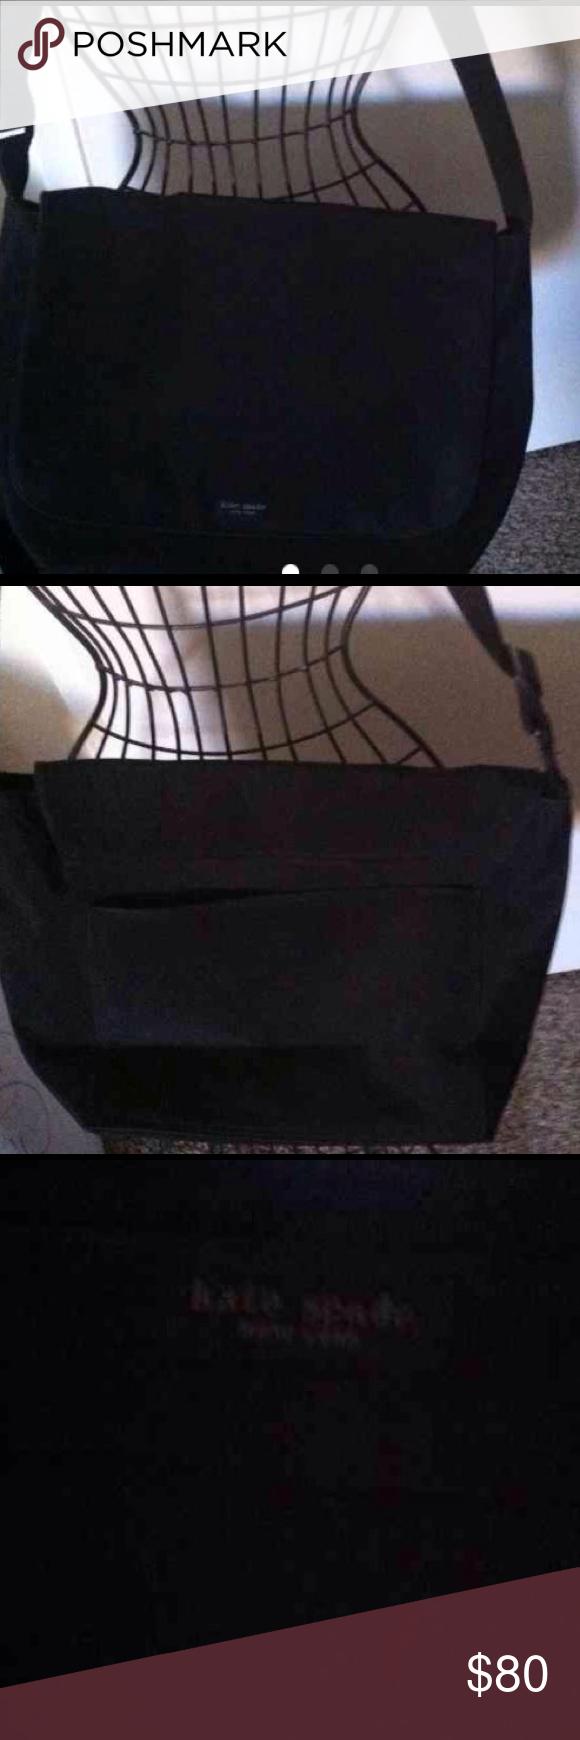 Kate spade messenger bag Great shape like new kate spade Bags Crossbody Bags